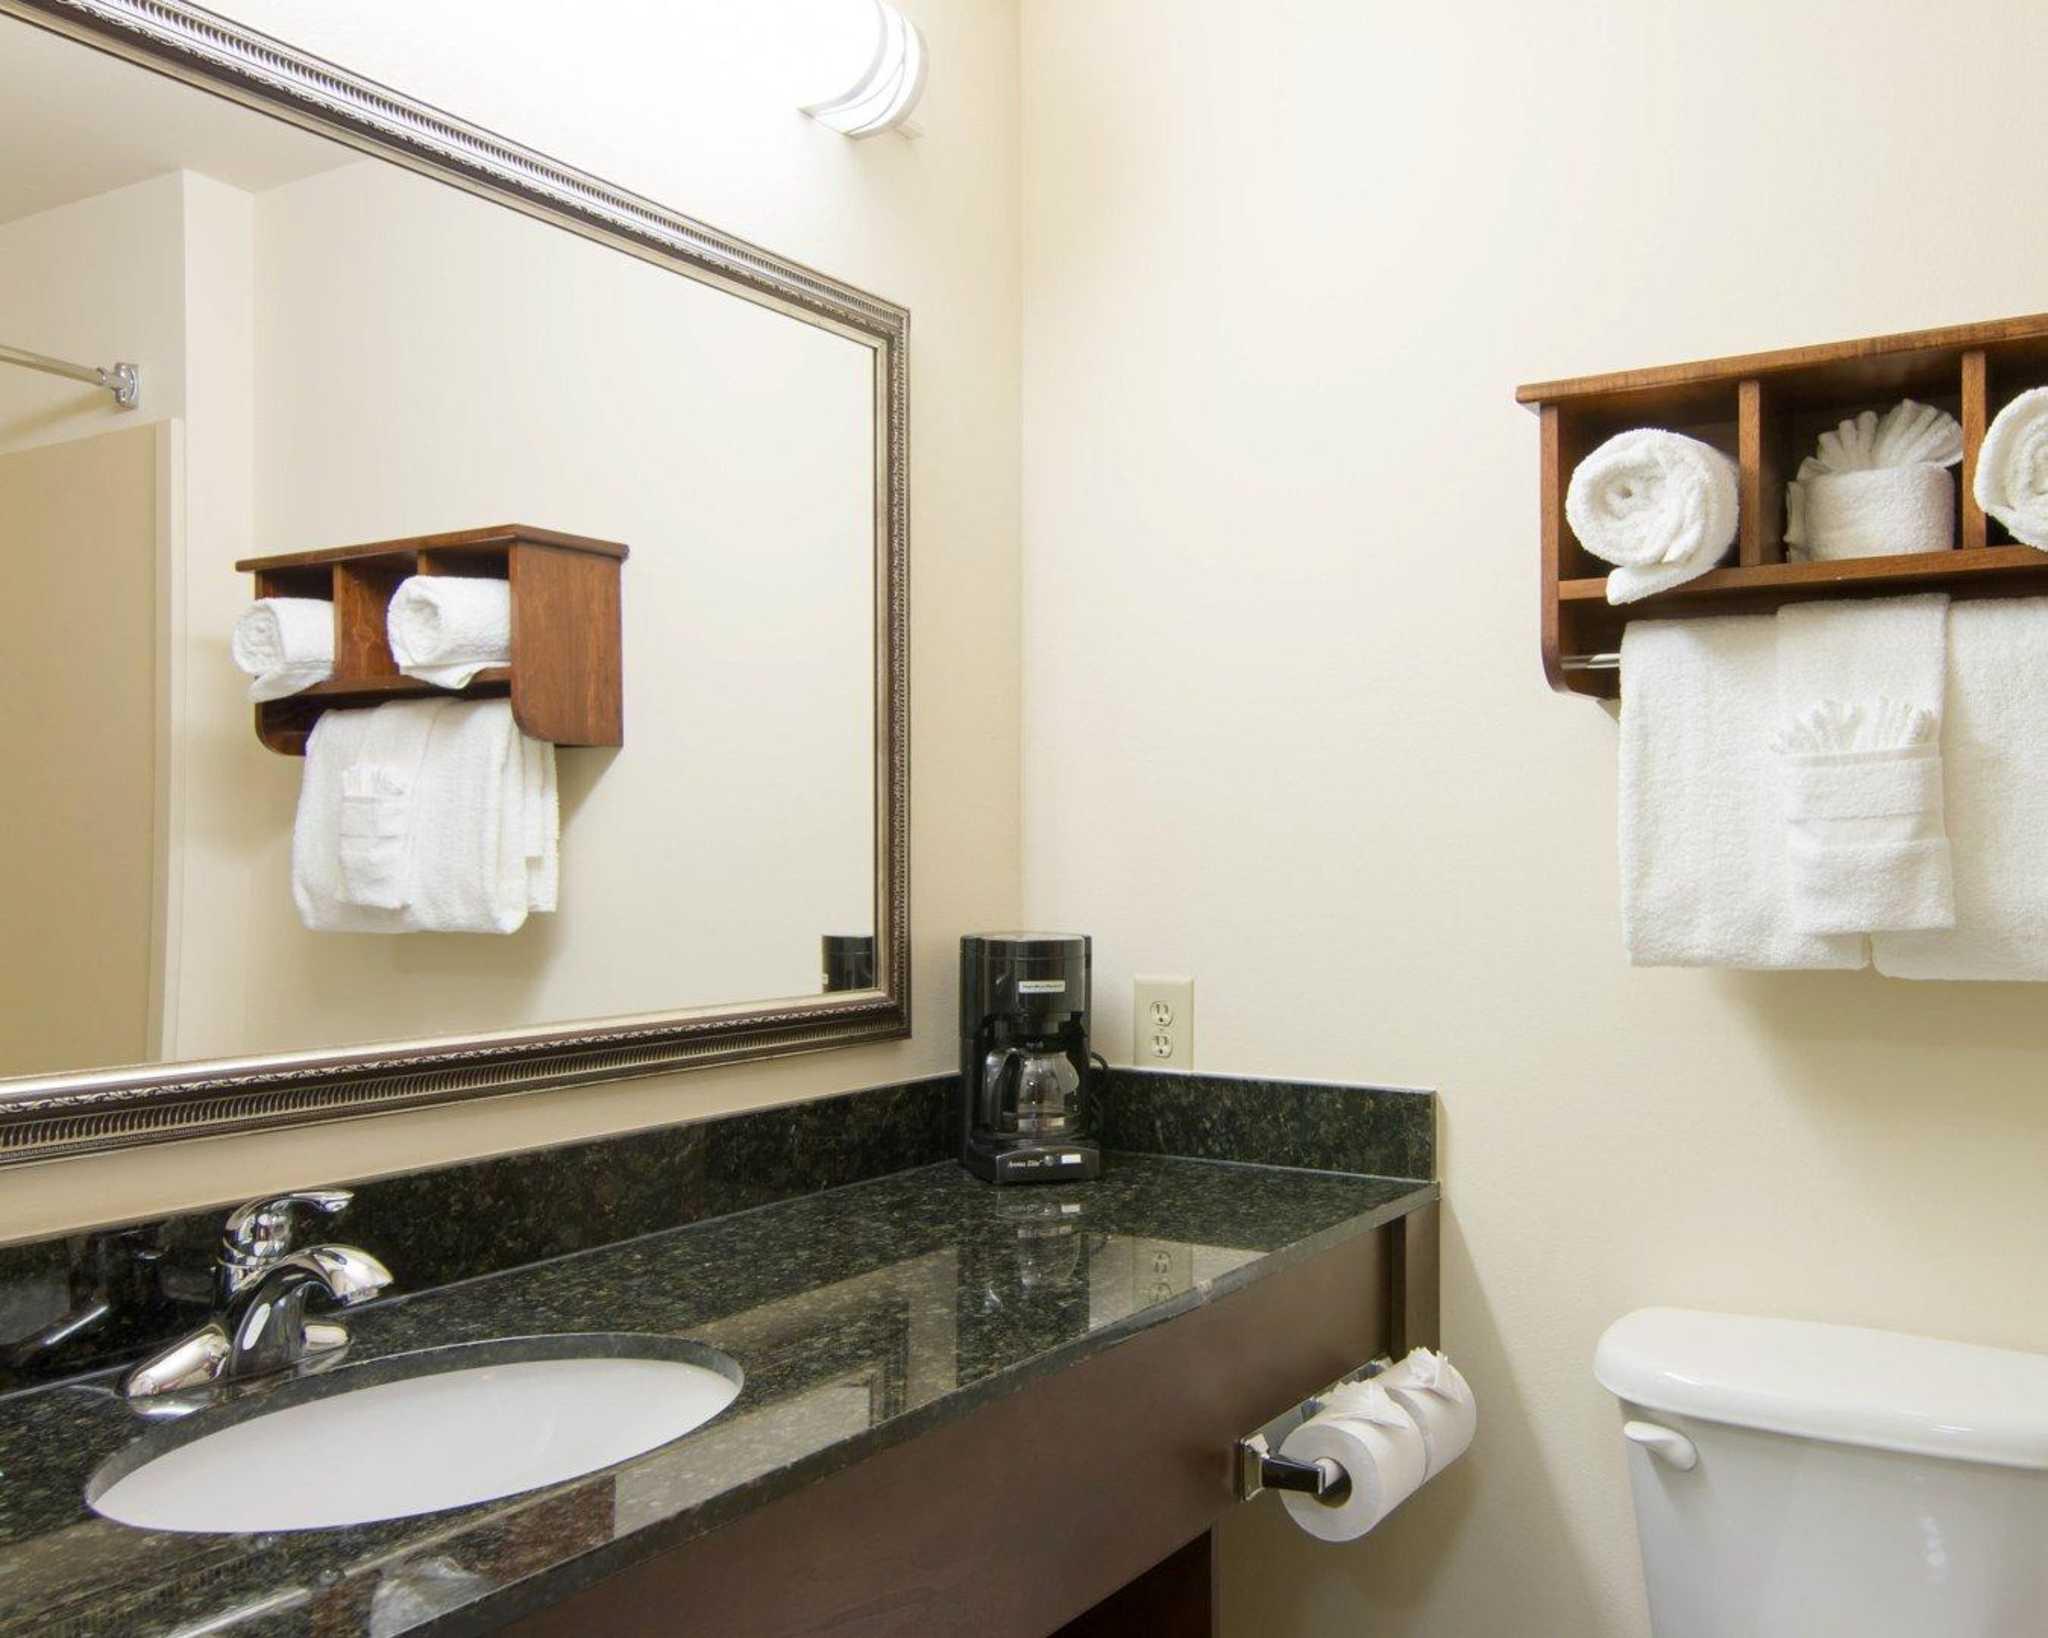 Comfort Inn & Suites Airport image 25